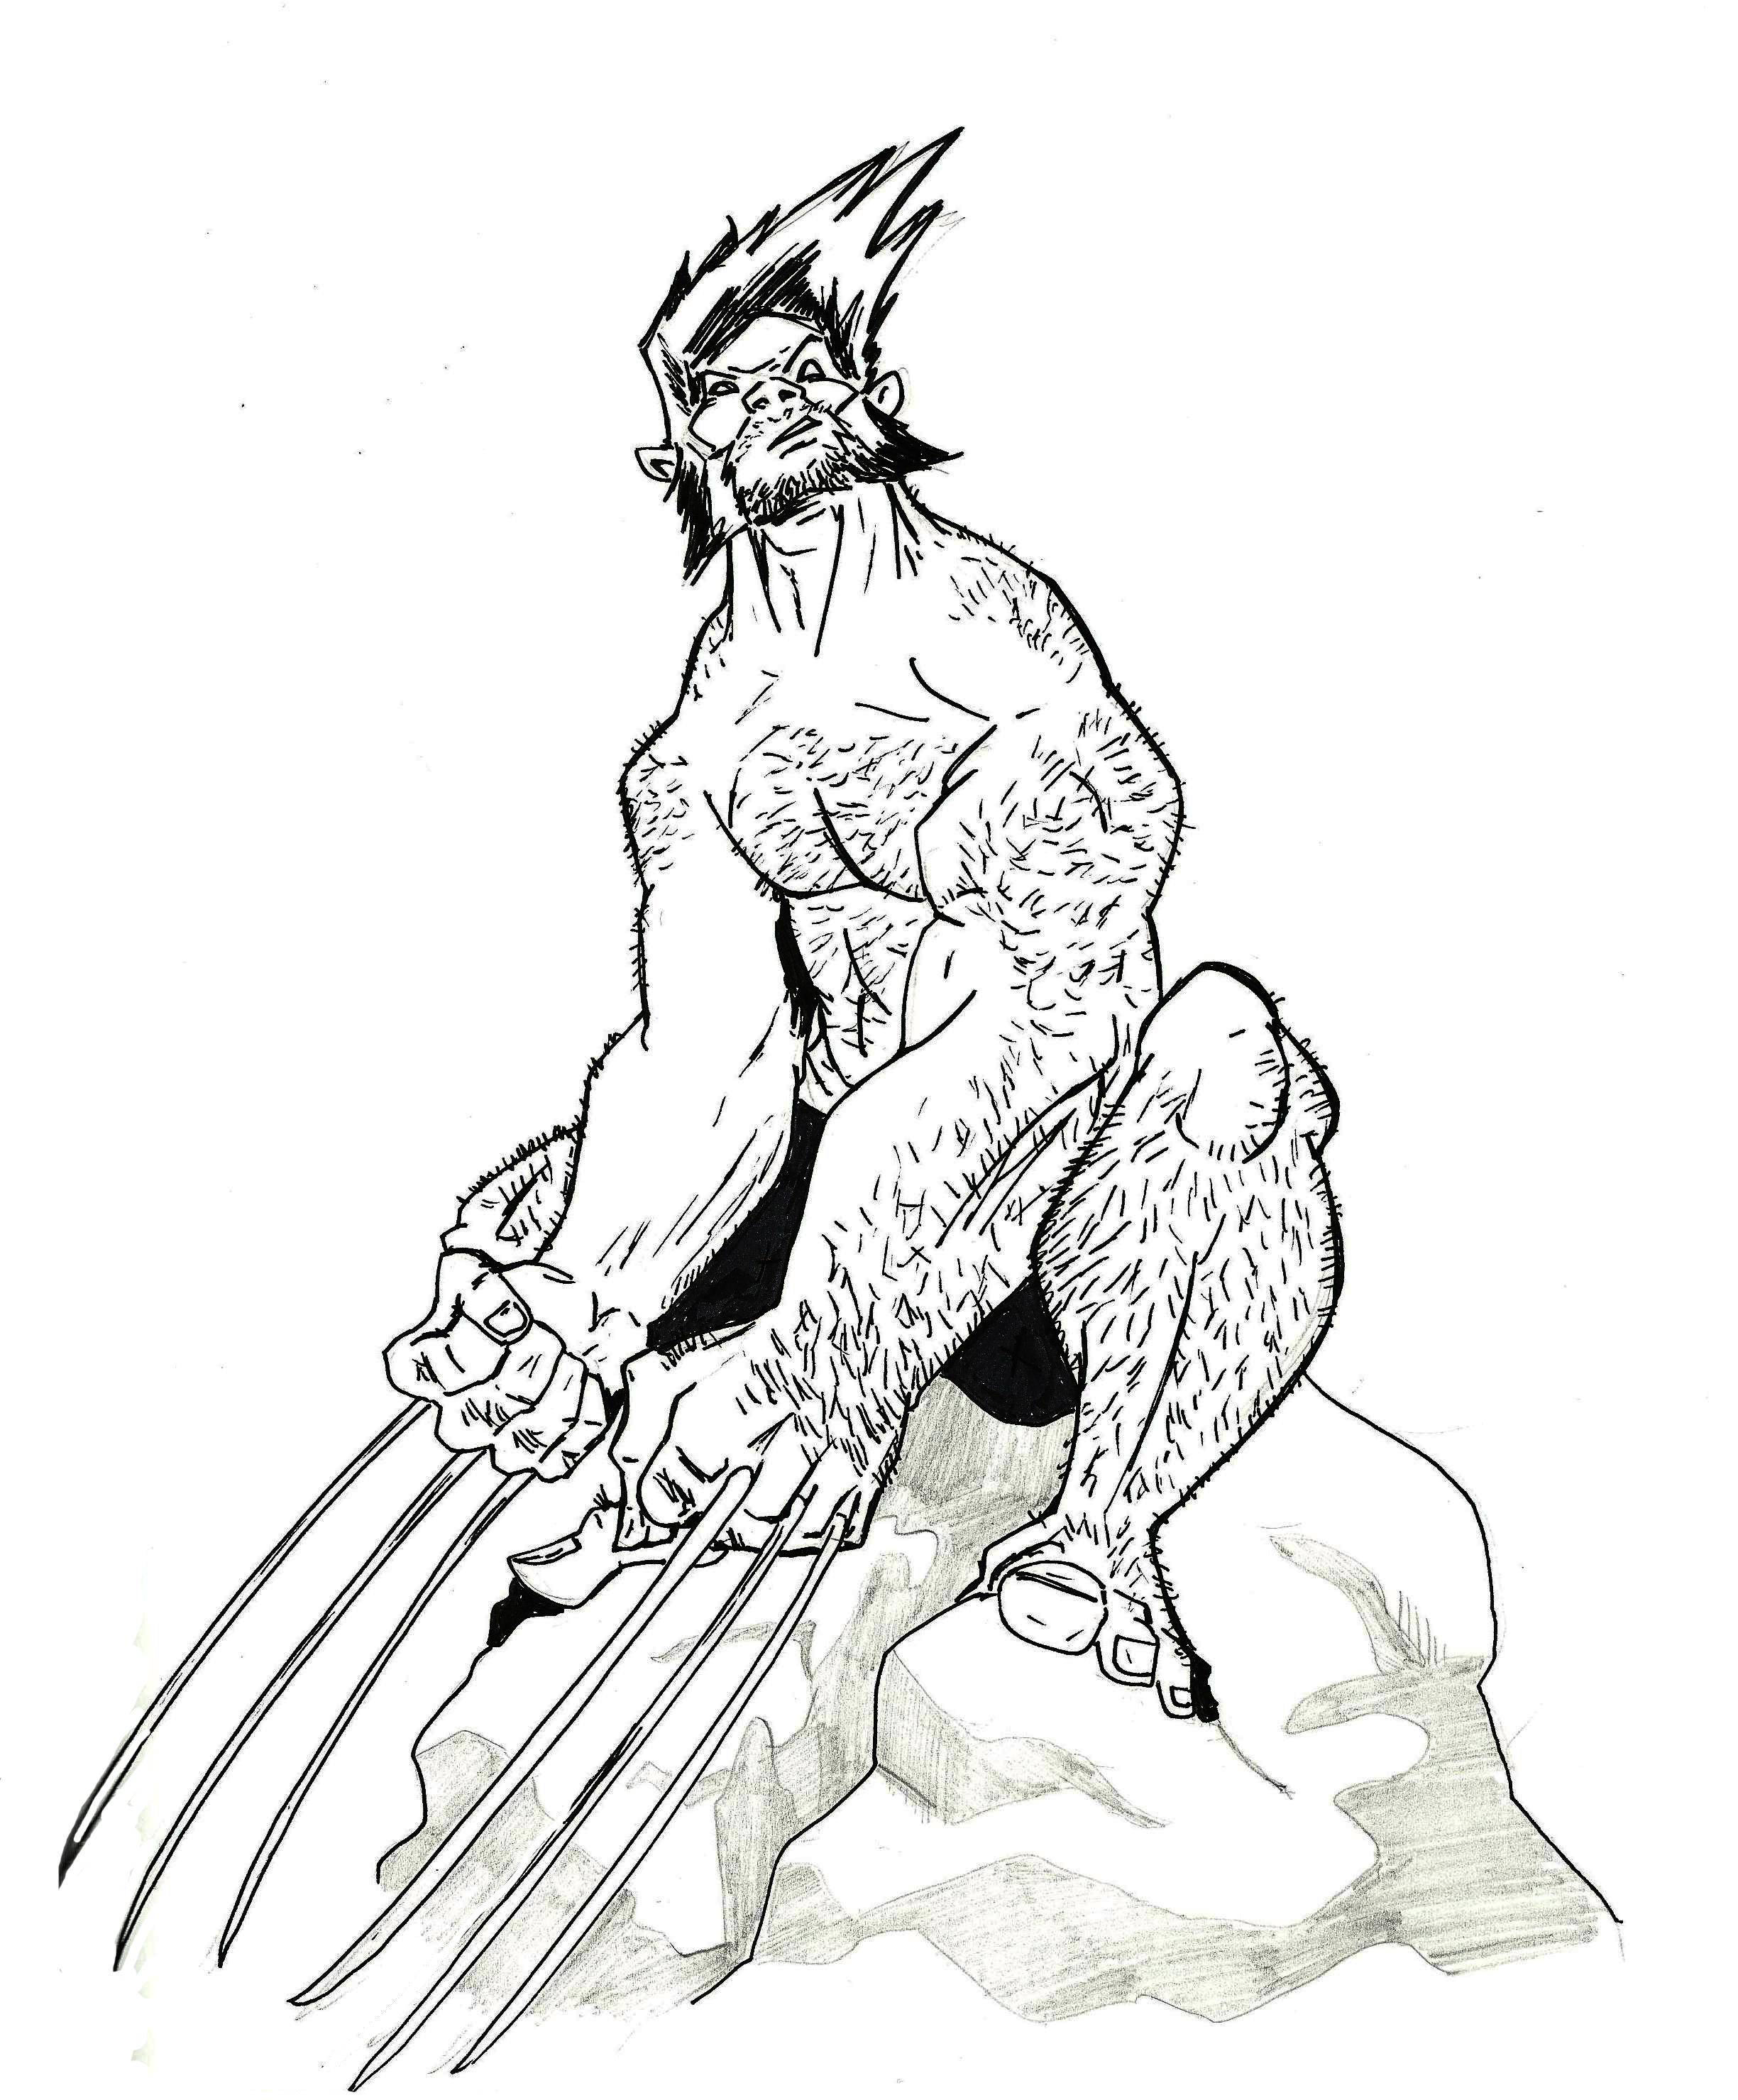 Illustrations by Ben Kim at Coroflot.com